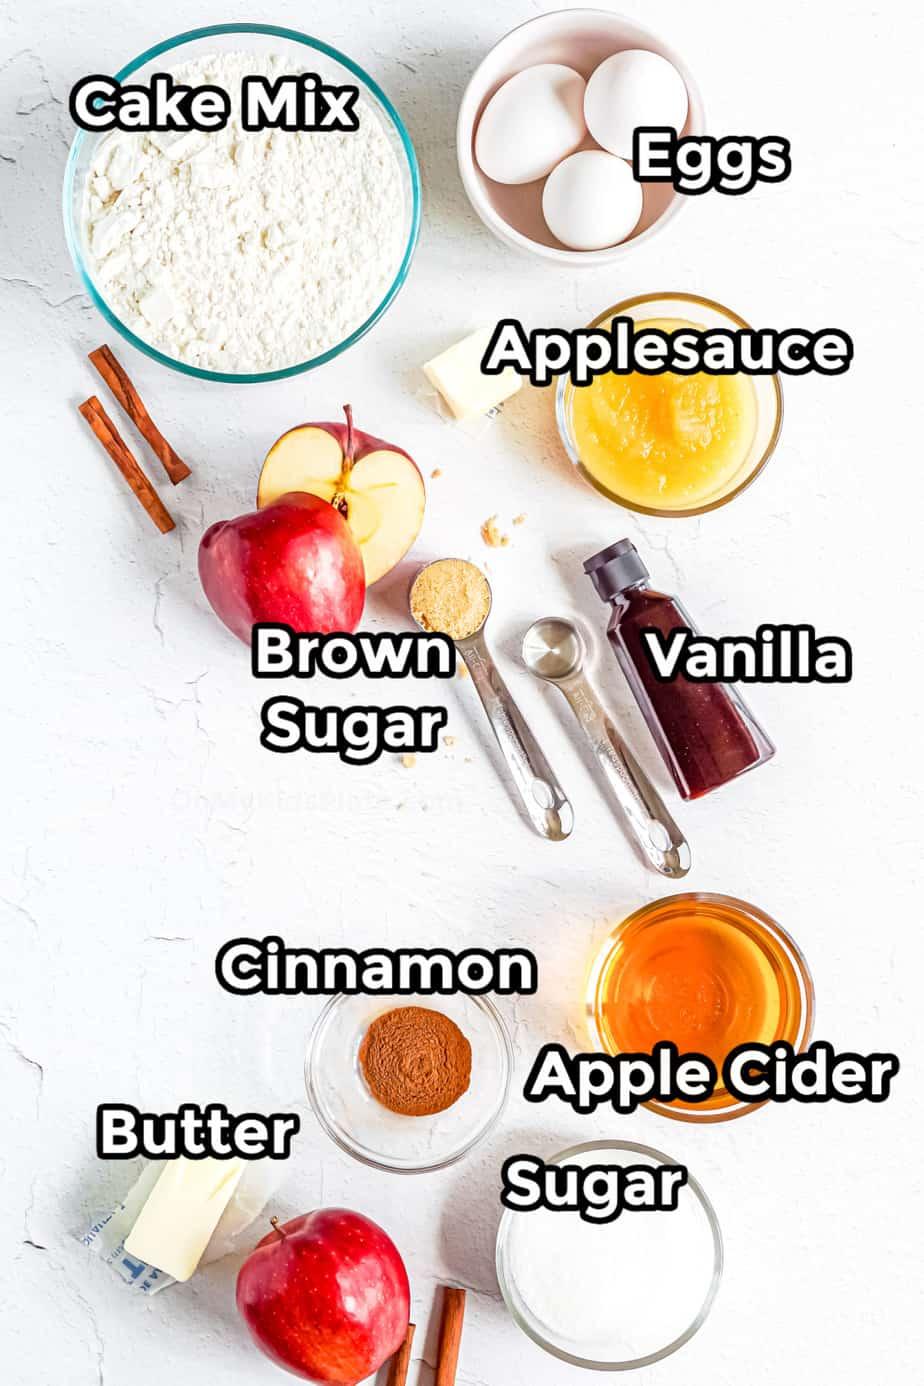 Ingredients for apple cider doughnut cake labeled.